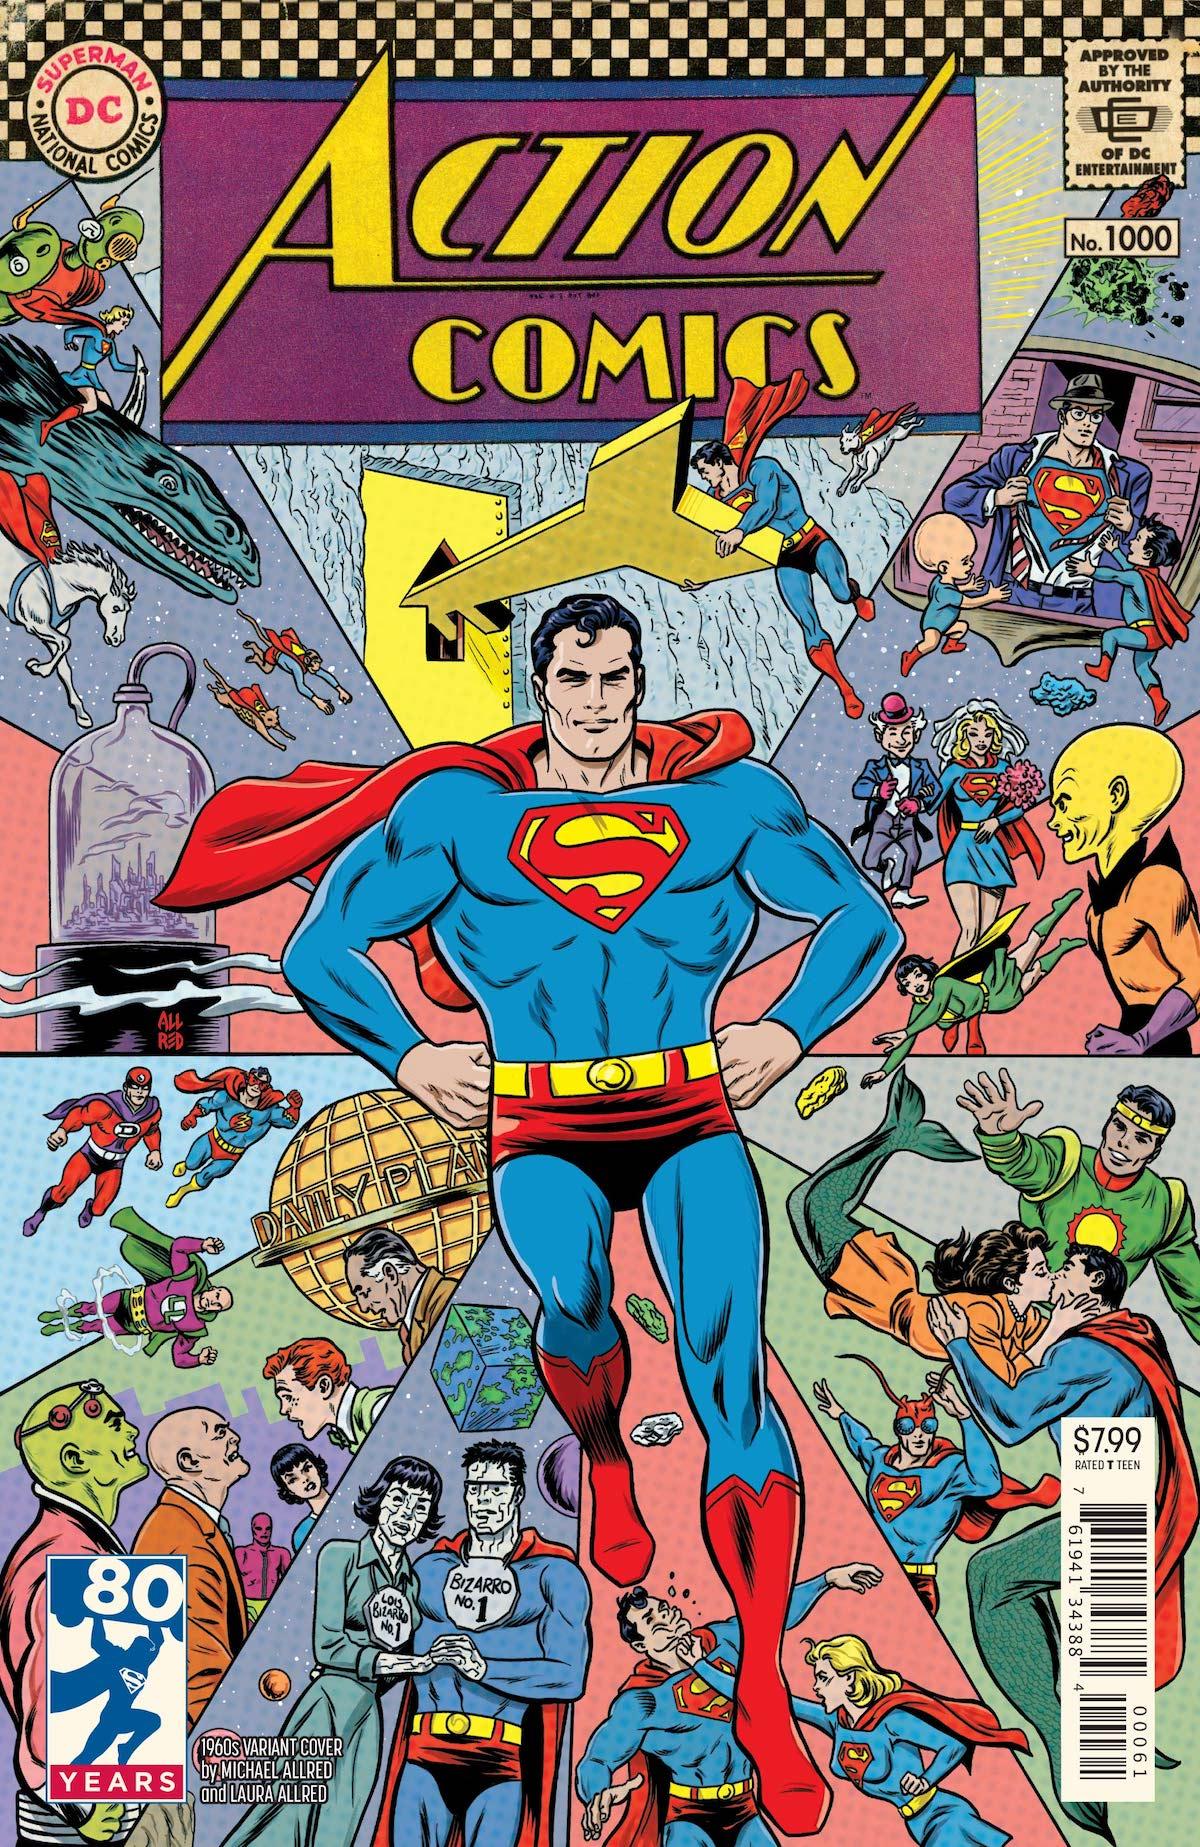 Action Comics 1,000 Michael Allred variant